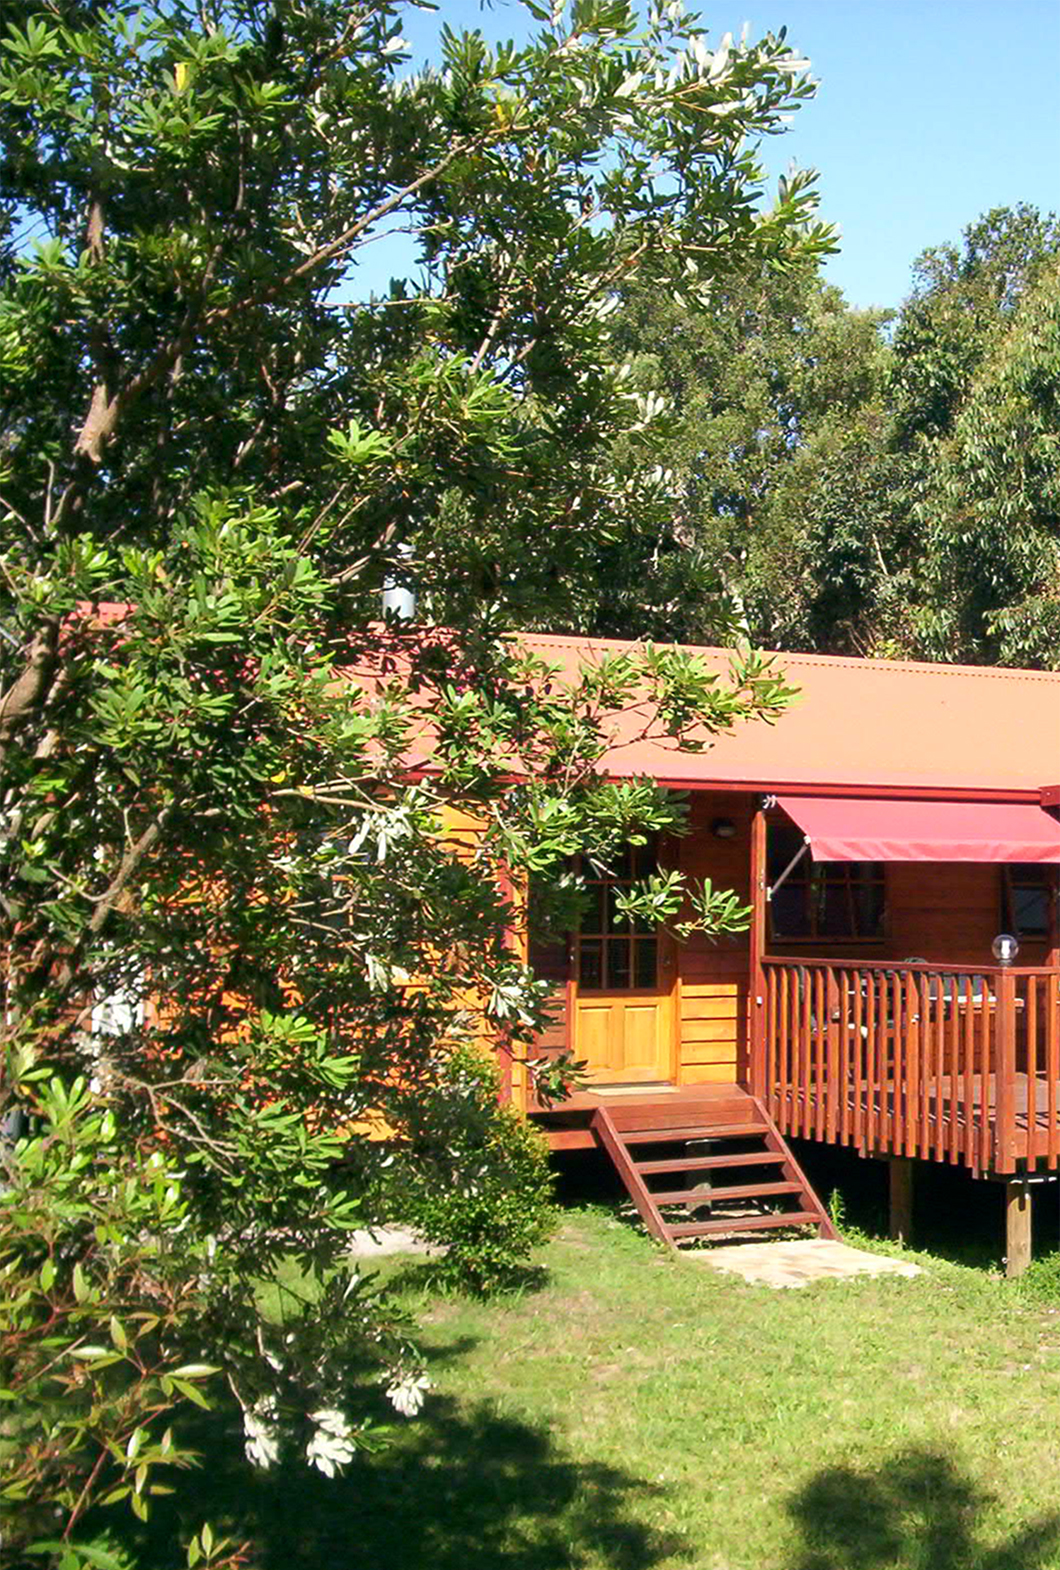 Melaleuca Seaside Retreat - Banksia Cottage Peek Through Trees